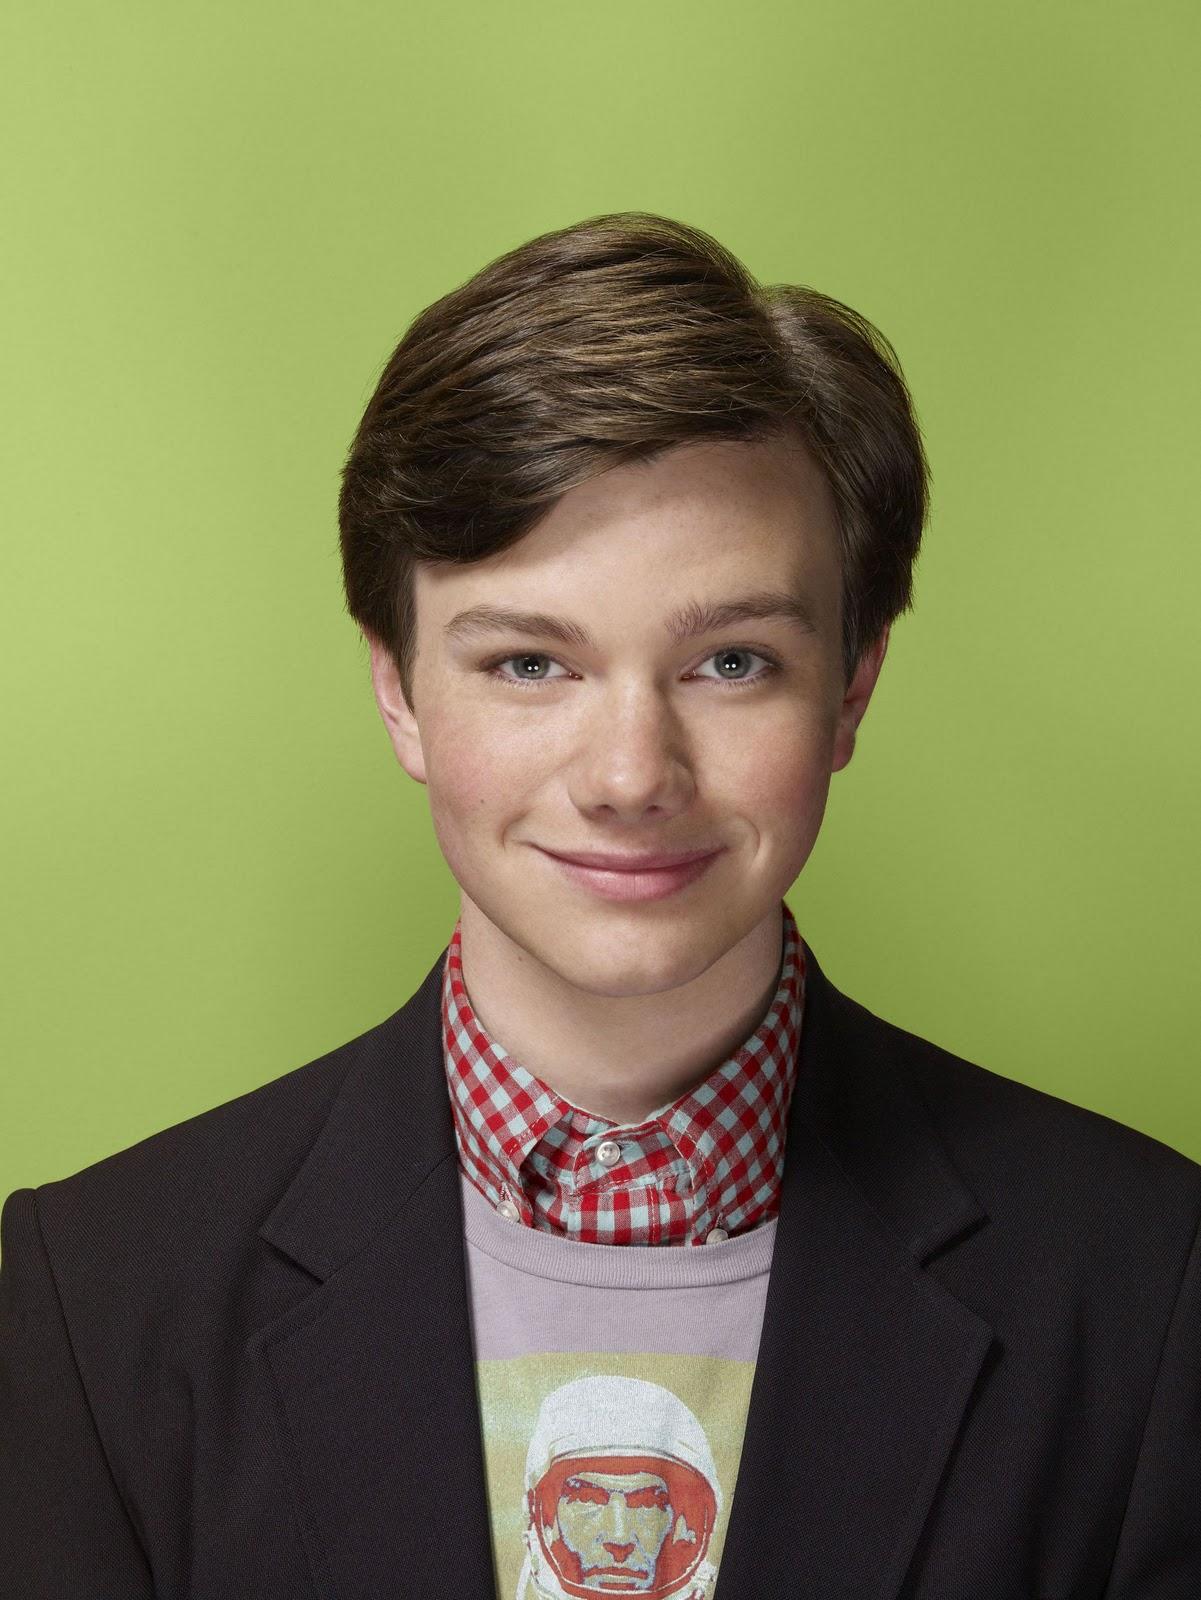 Kurt Glee model for young gay kids.